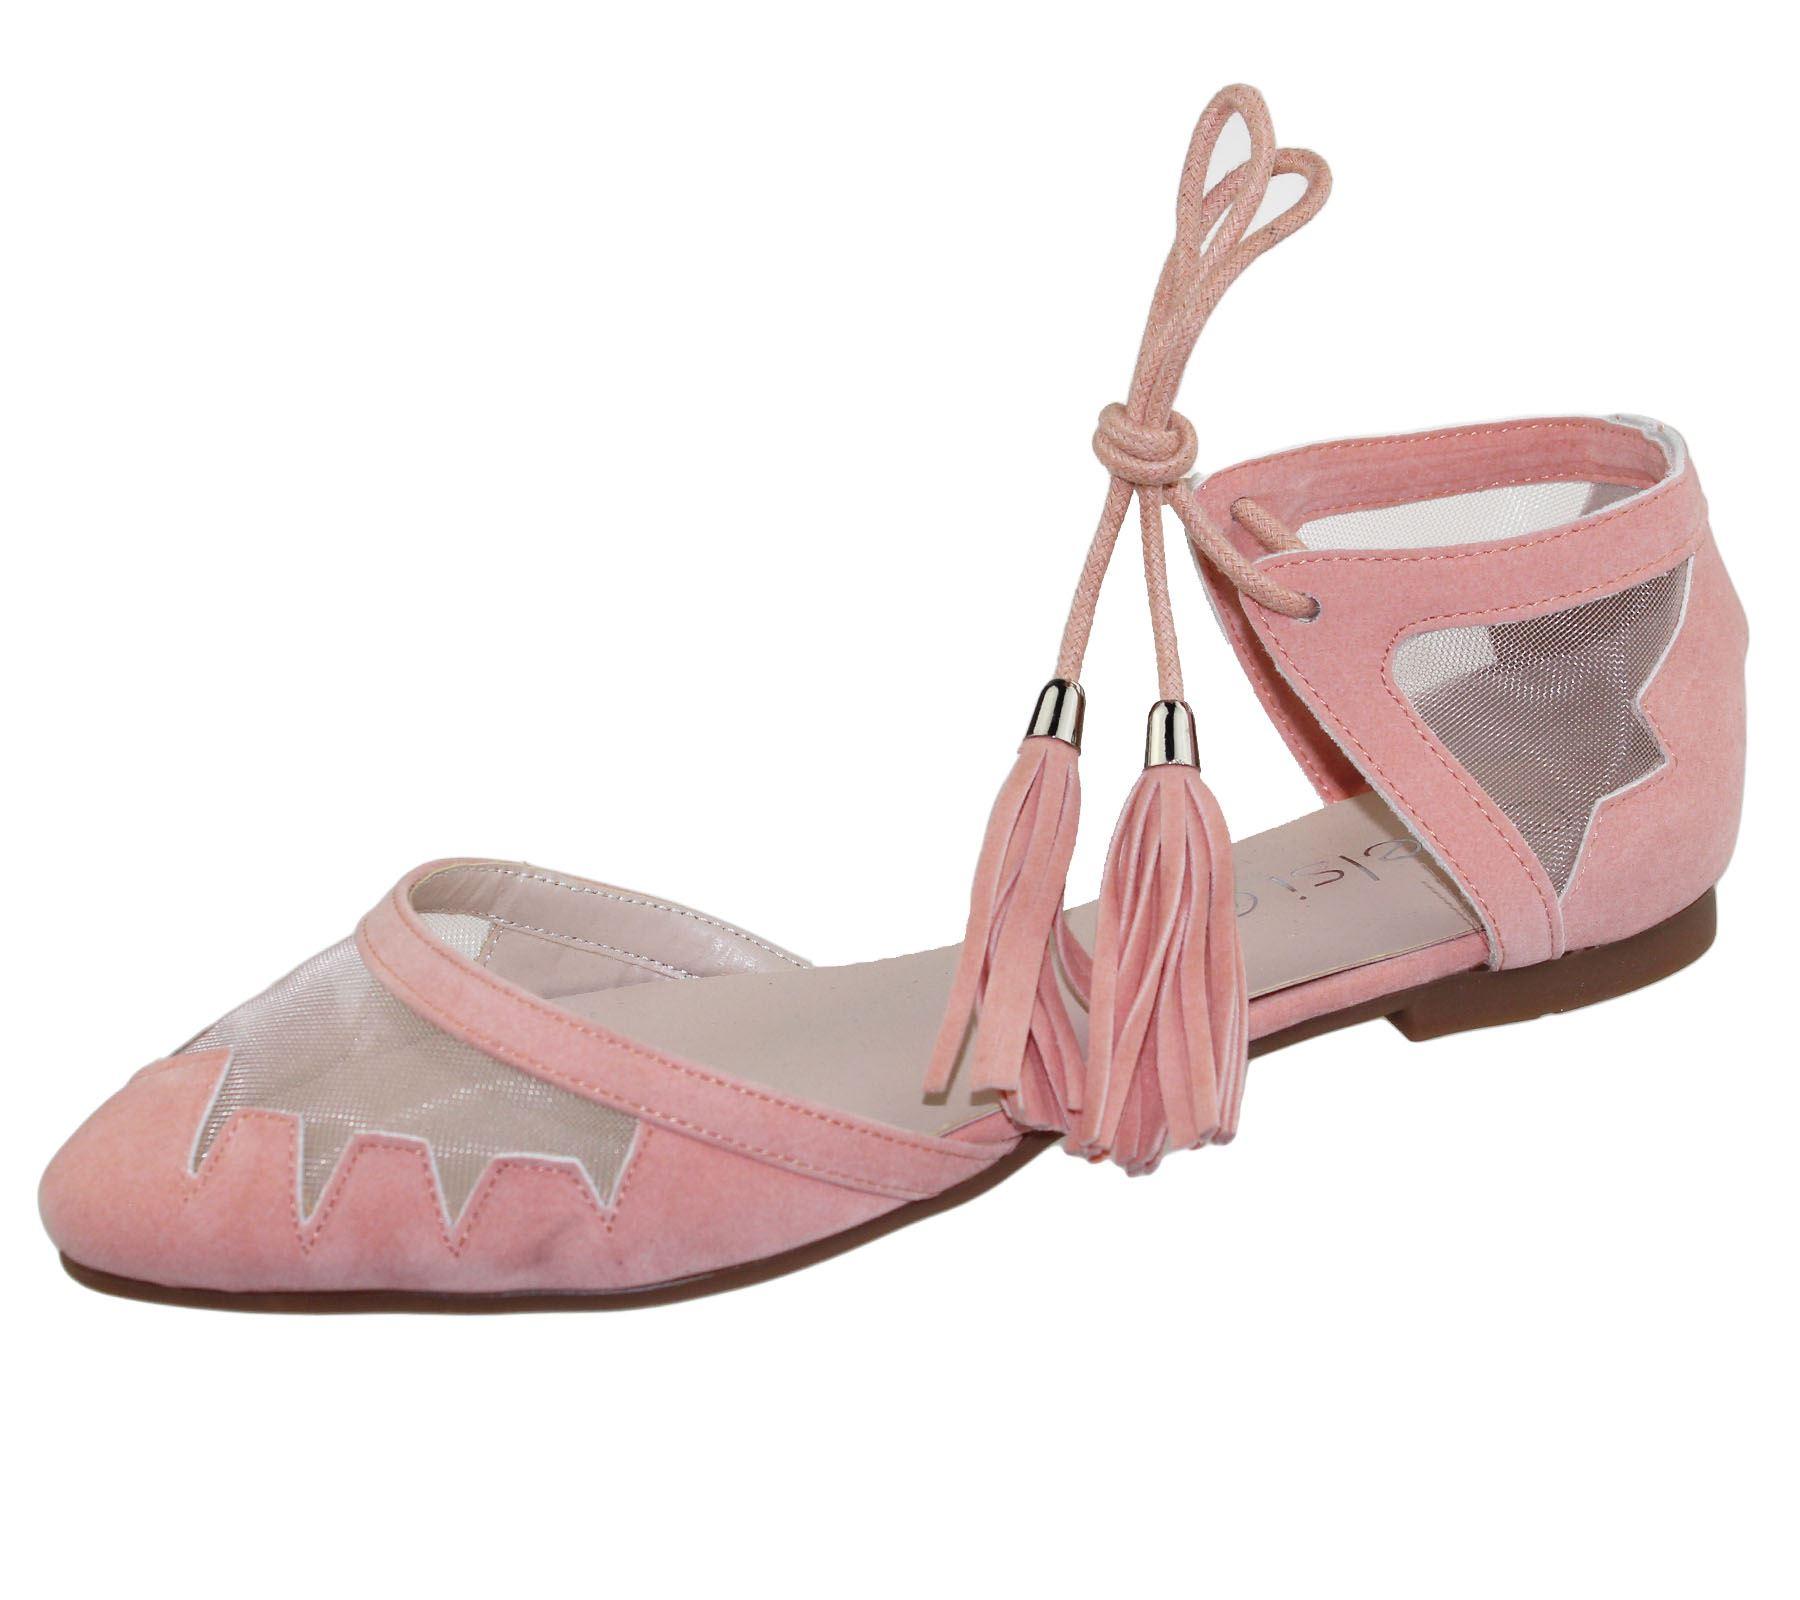 Womens-Flat-Ballerina-Dolly-Pumps-Ballet-Ladies-Summer-Mesh-Tassel-Shoes-Sandals thumbnail 32